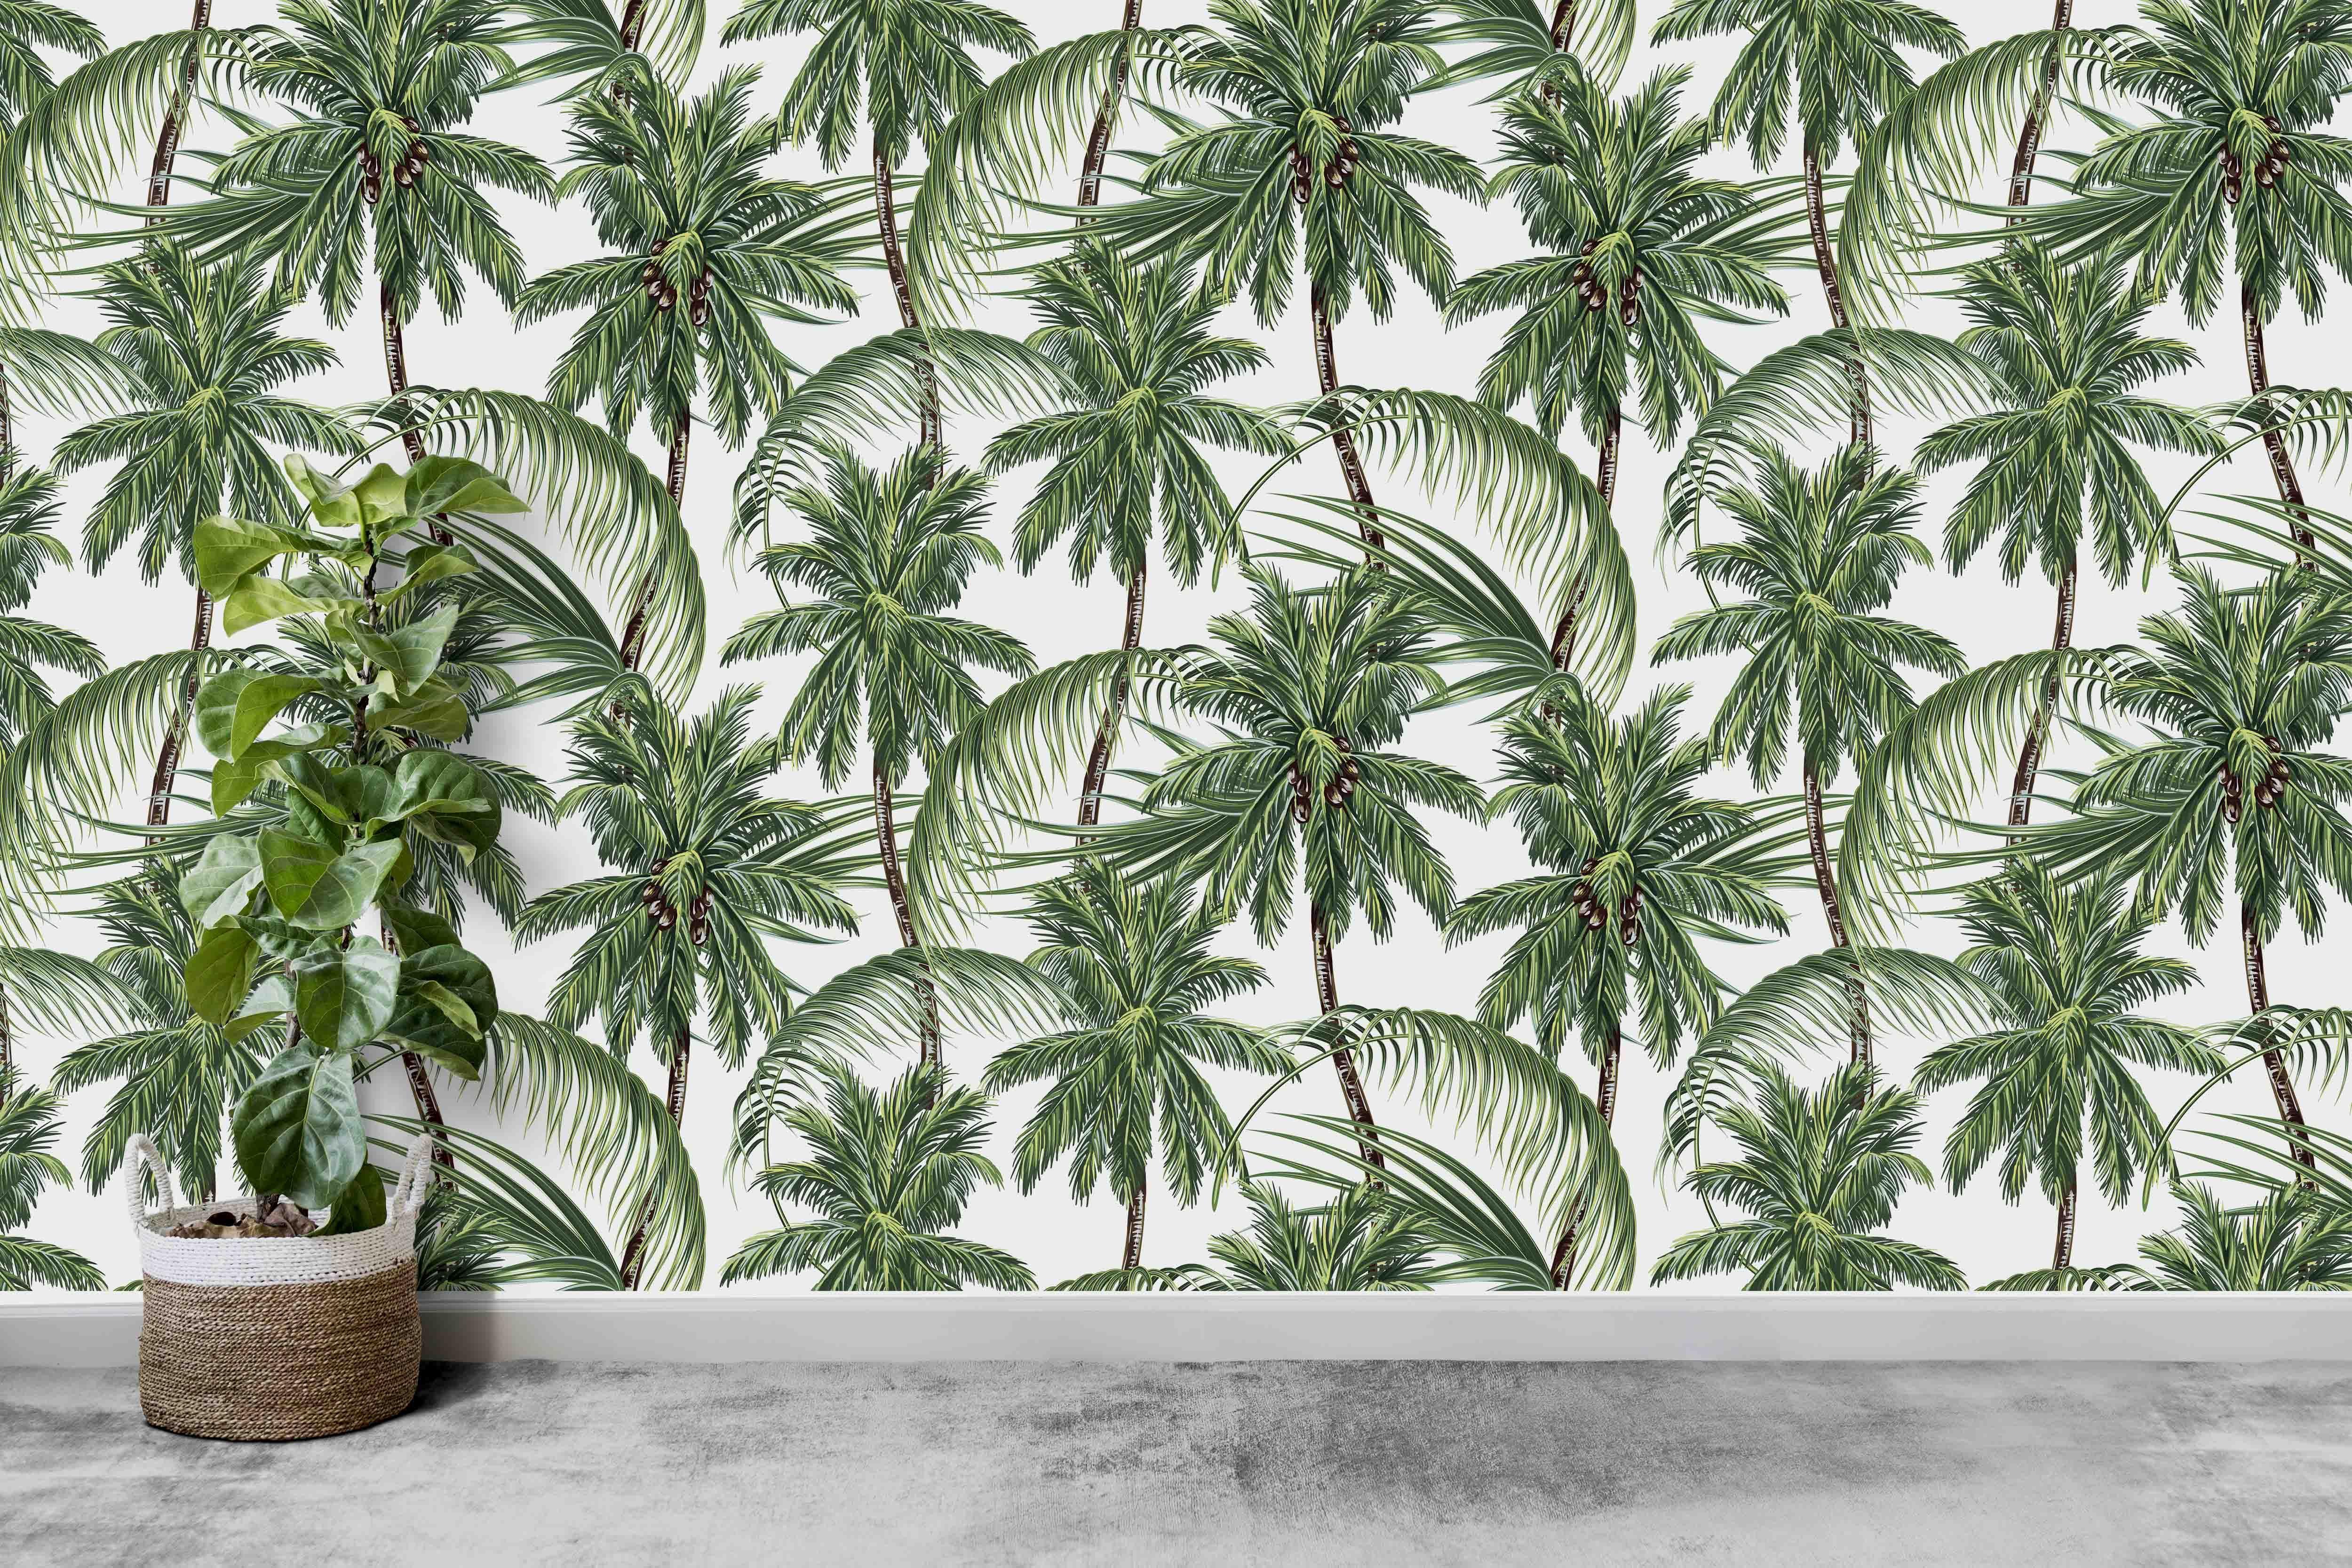 Tropical Paradise Wallpaper Palms Wallcovering Palm Print Wallpaper Tropical Modern Home Dec Palm Print Wallpaper Tropical Paradise Wallpaper Palm Wallpaper